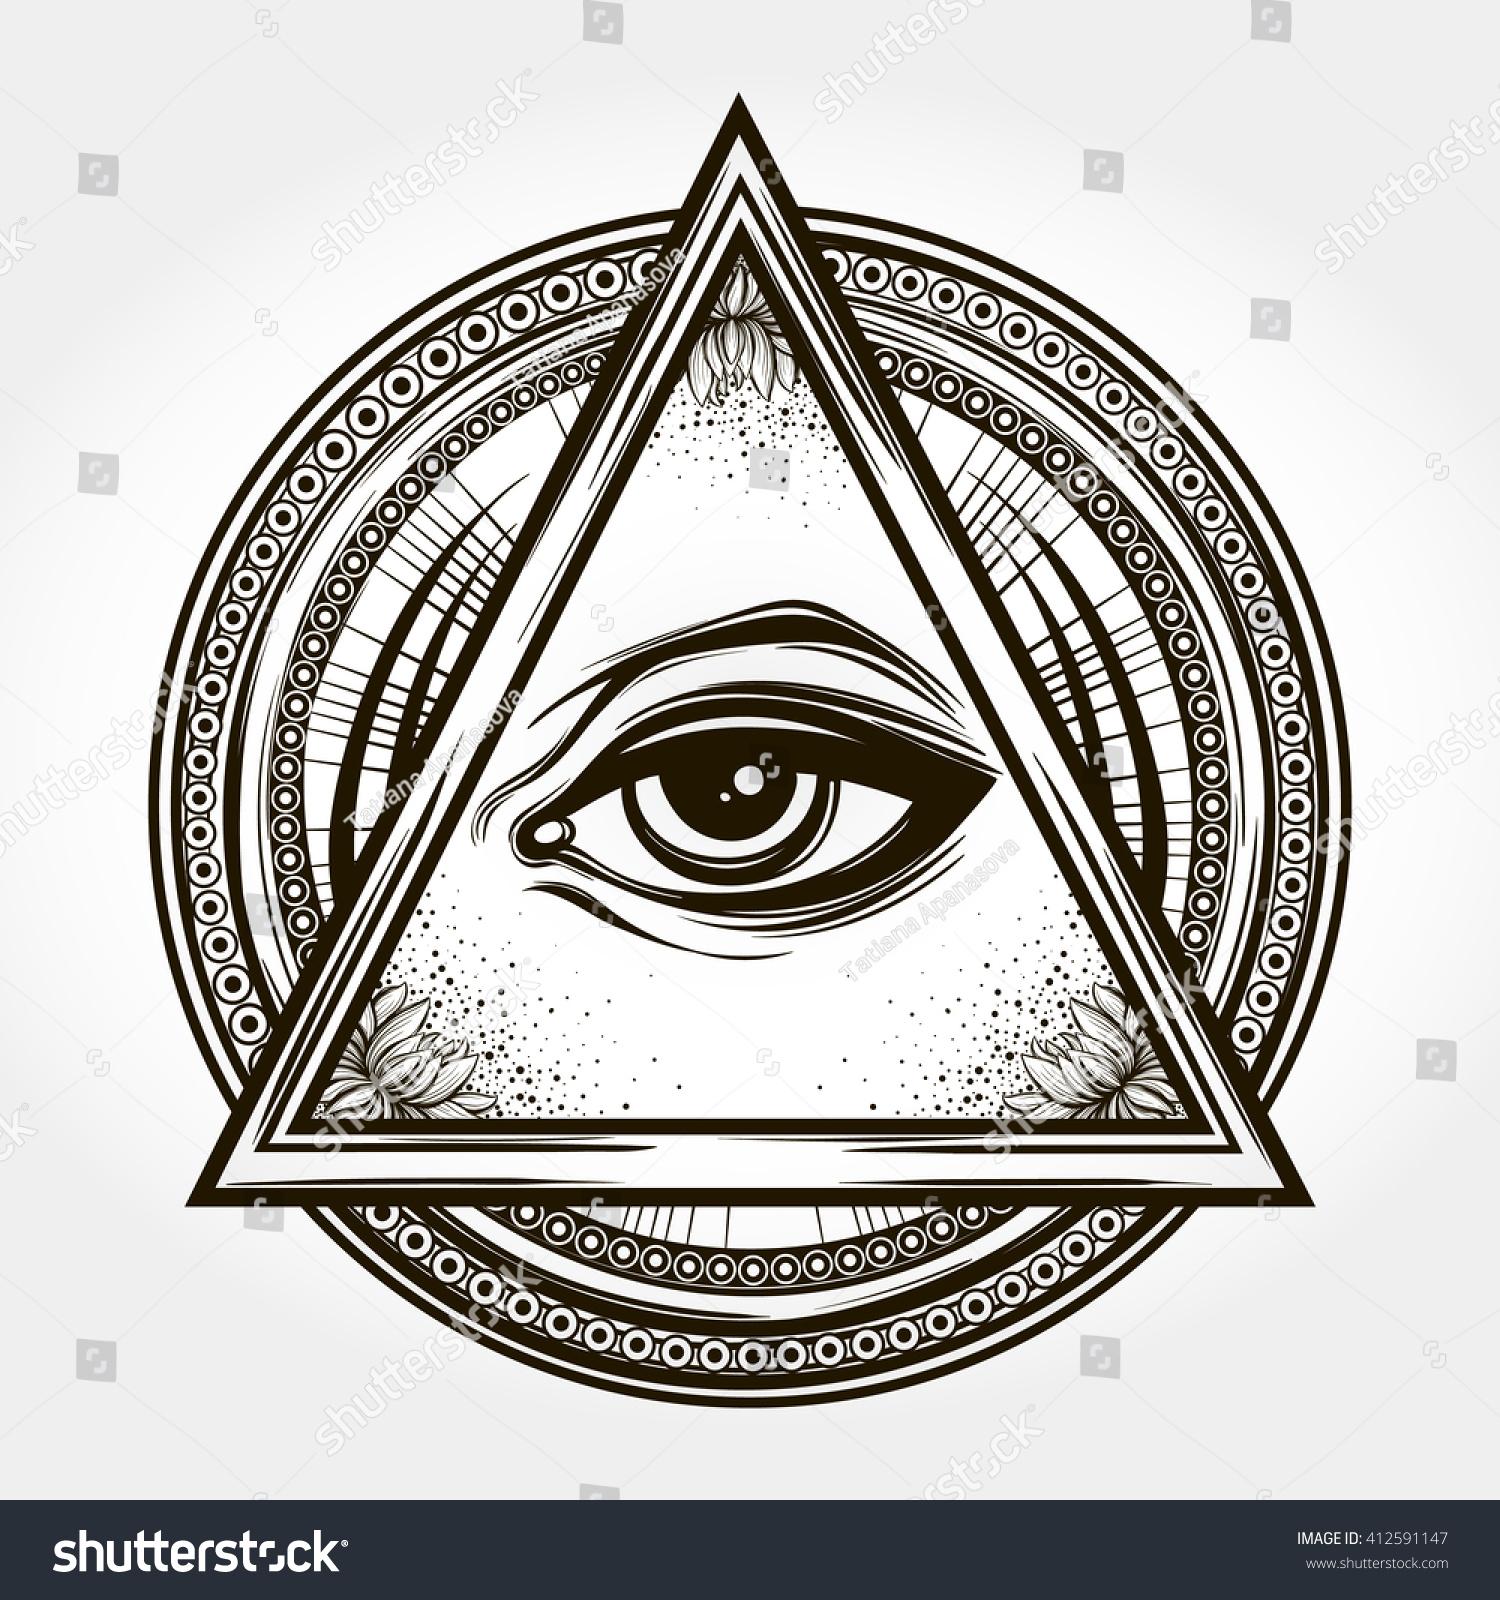 Handdrawn Eye Providence All Seeing Eye Stock Vector 2018